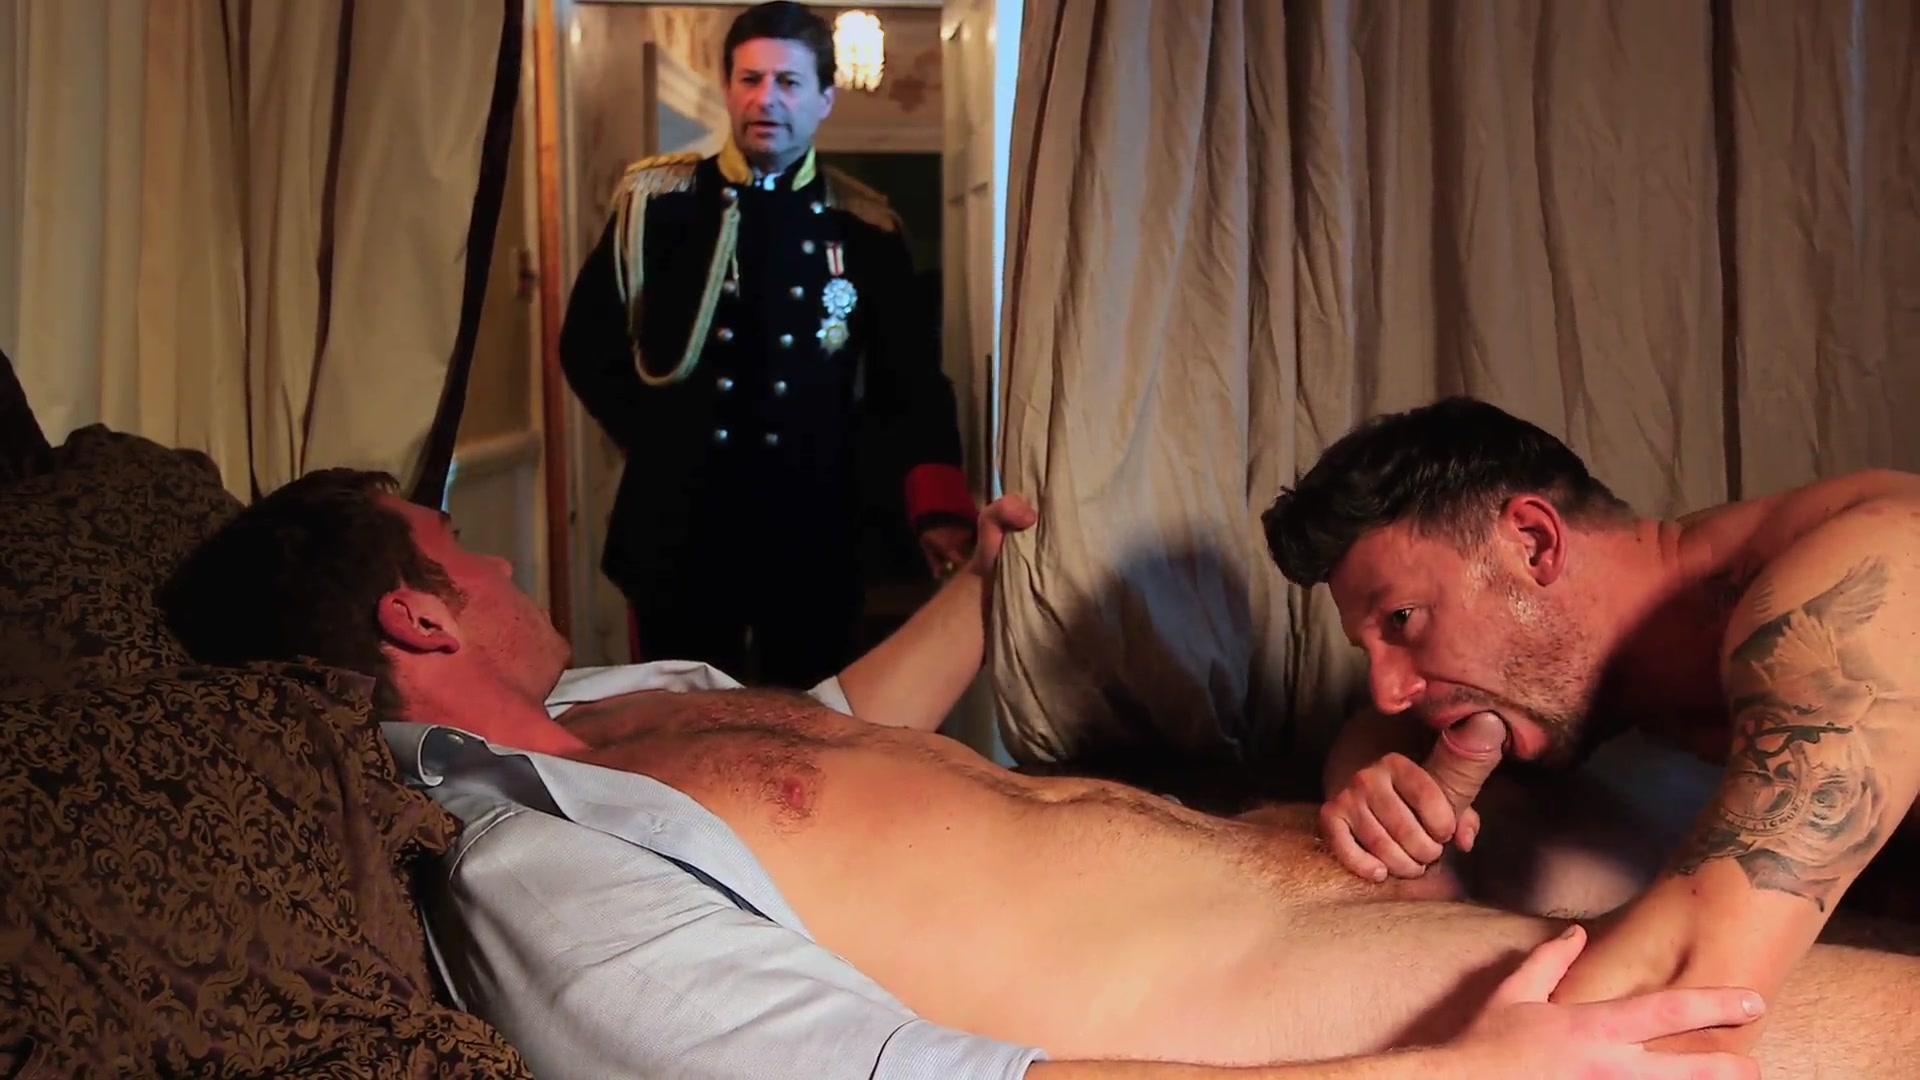 A Royal Fuckfest Gay Porn Free royal fuckfest, a | men gay porn movies @ gay dvd empire